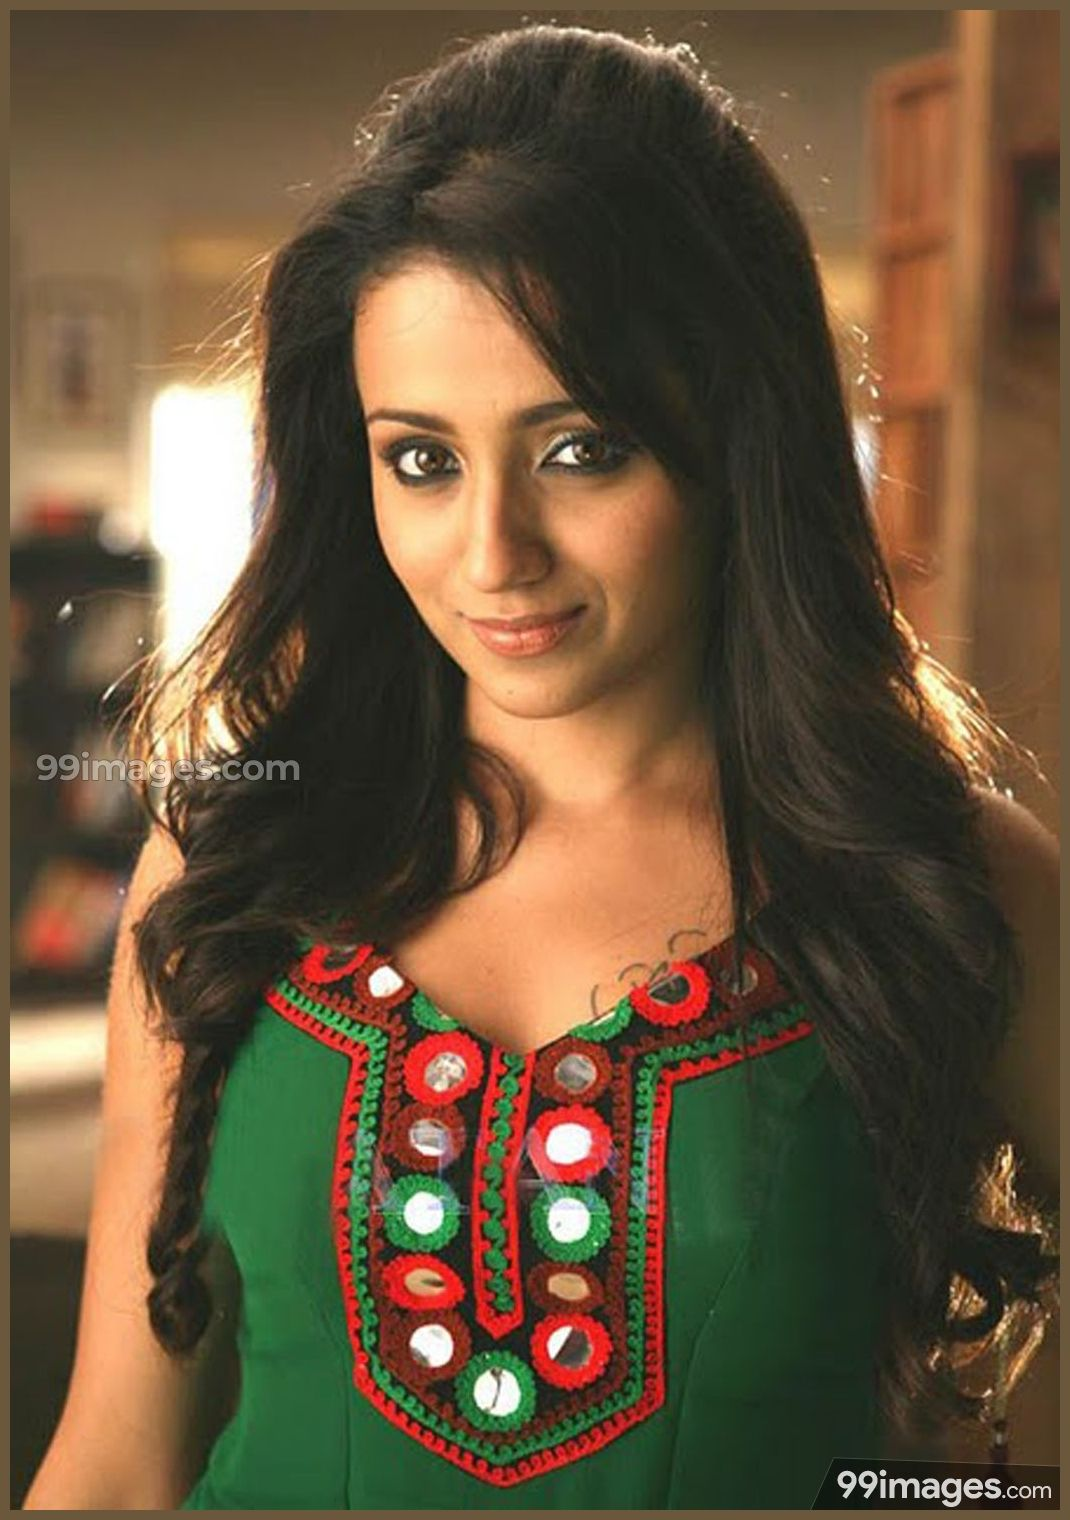 Trisha Krishnan Cute Hd Photos 1080p 3742 Trishakrishnan Actress Kollywood Tollywood Trisha Krishnan Actresses Beautiful Indian Actress